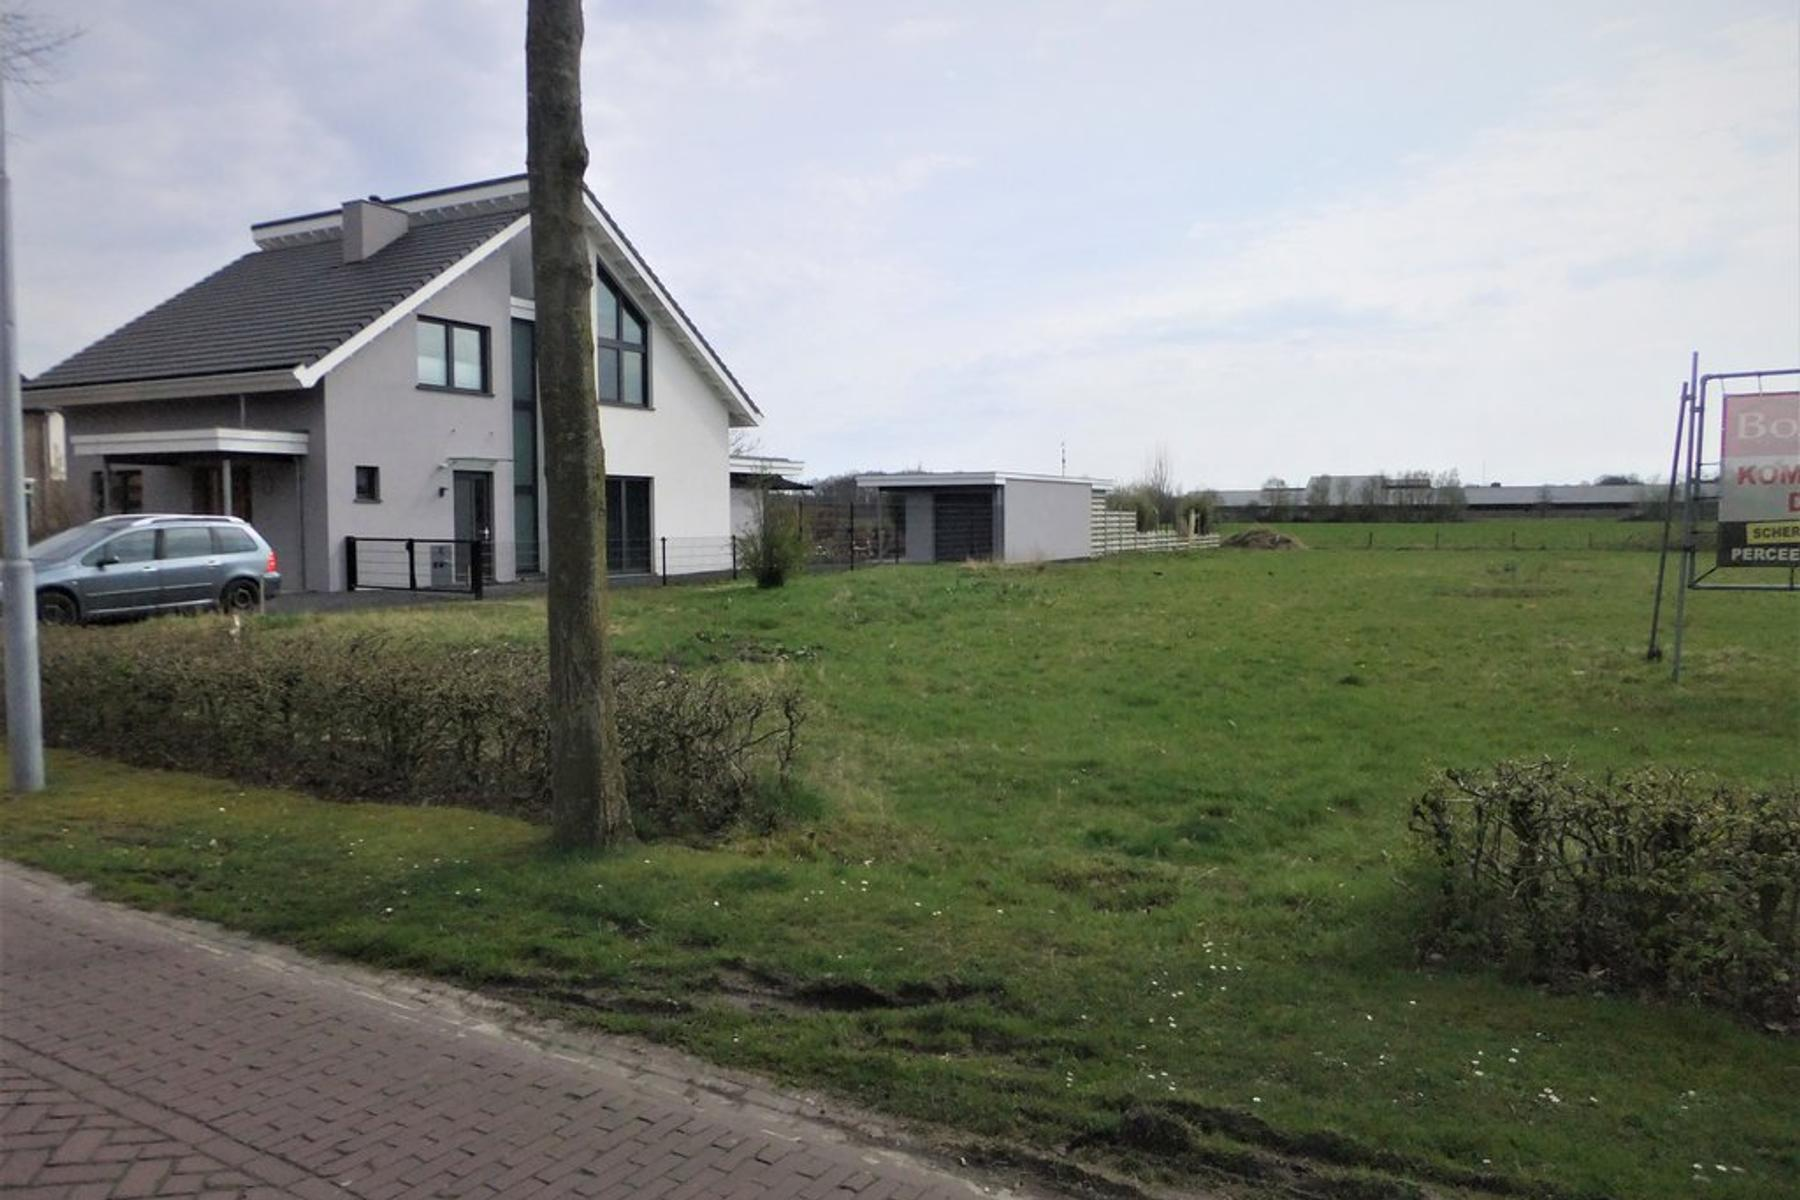 Willibrordlaan in Hulsel 5096 BG